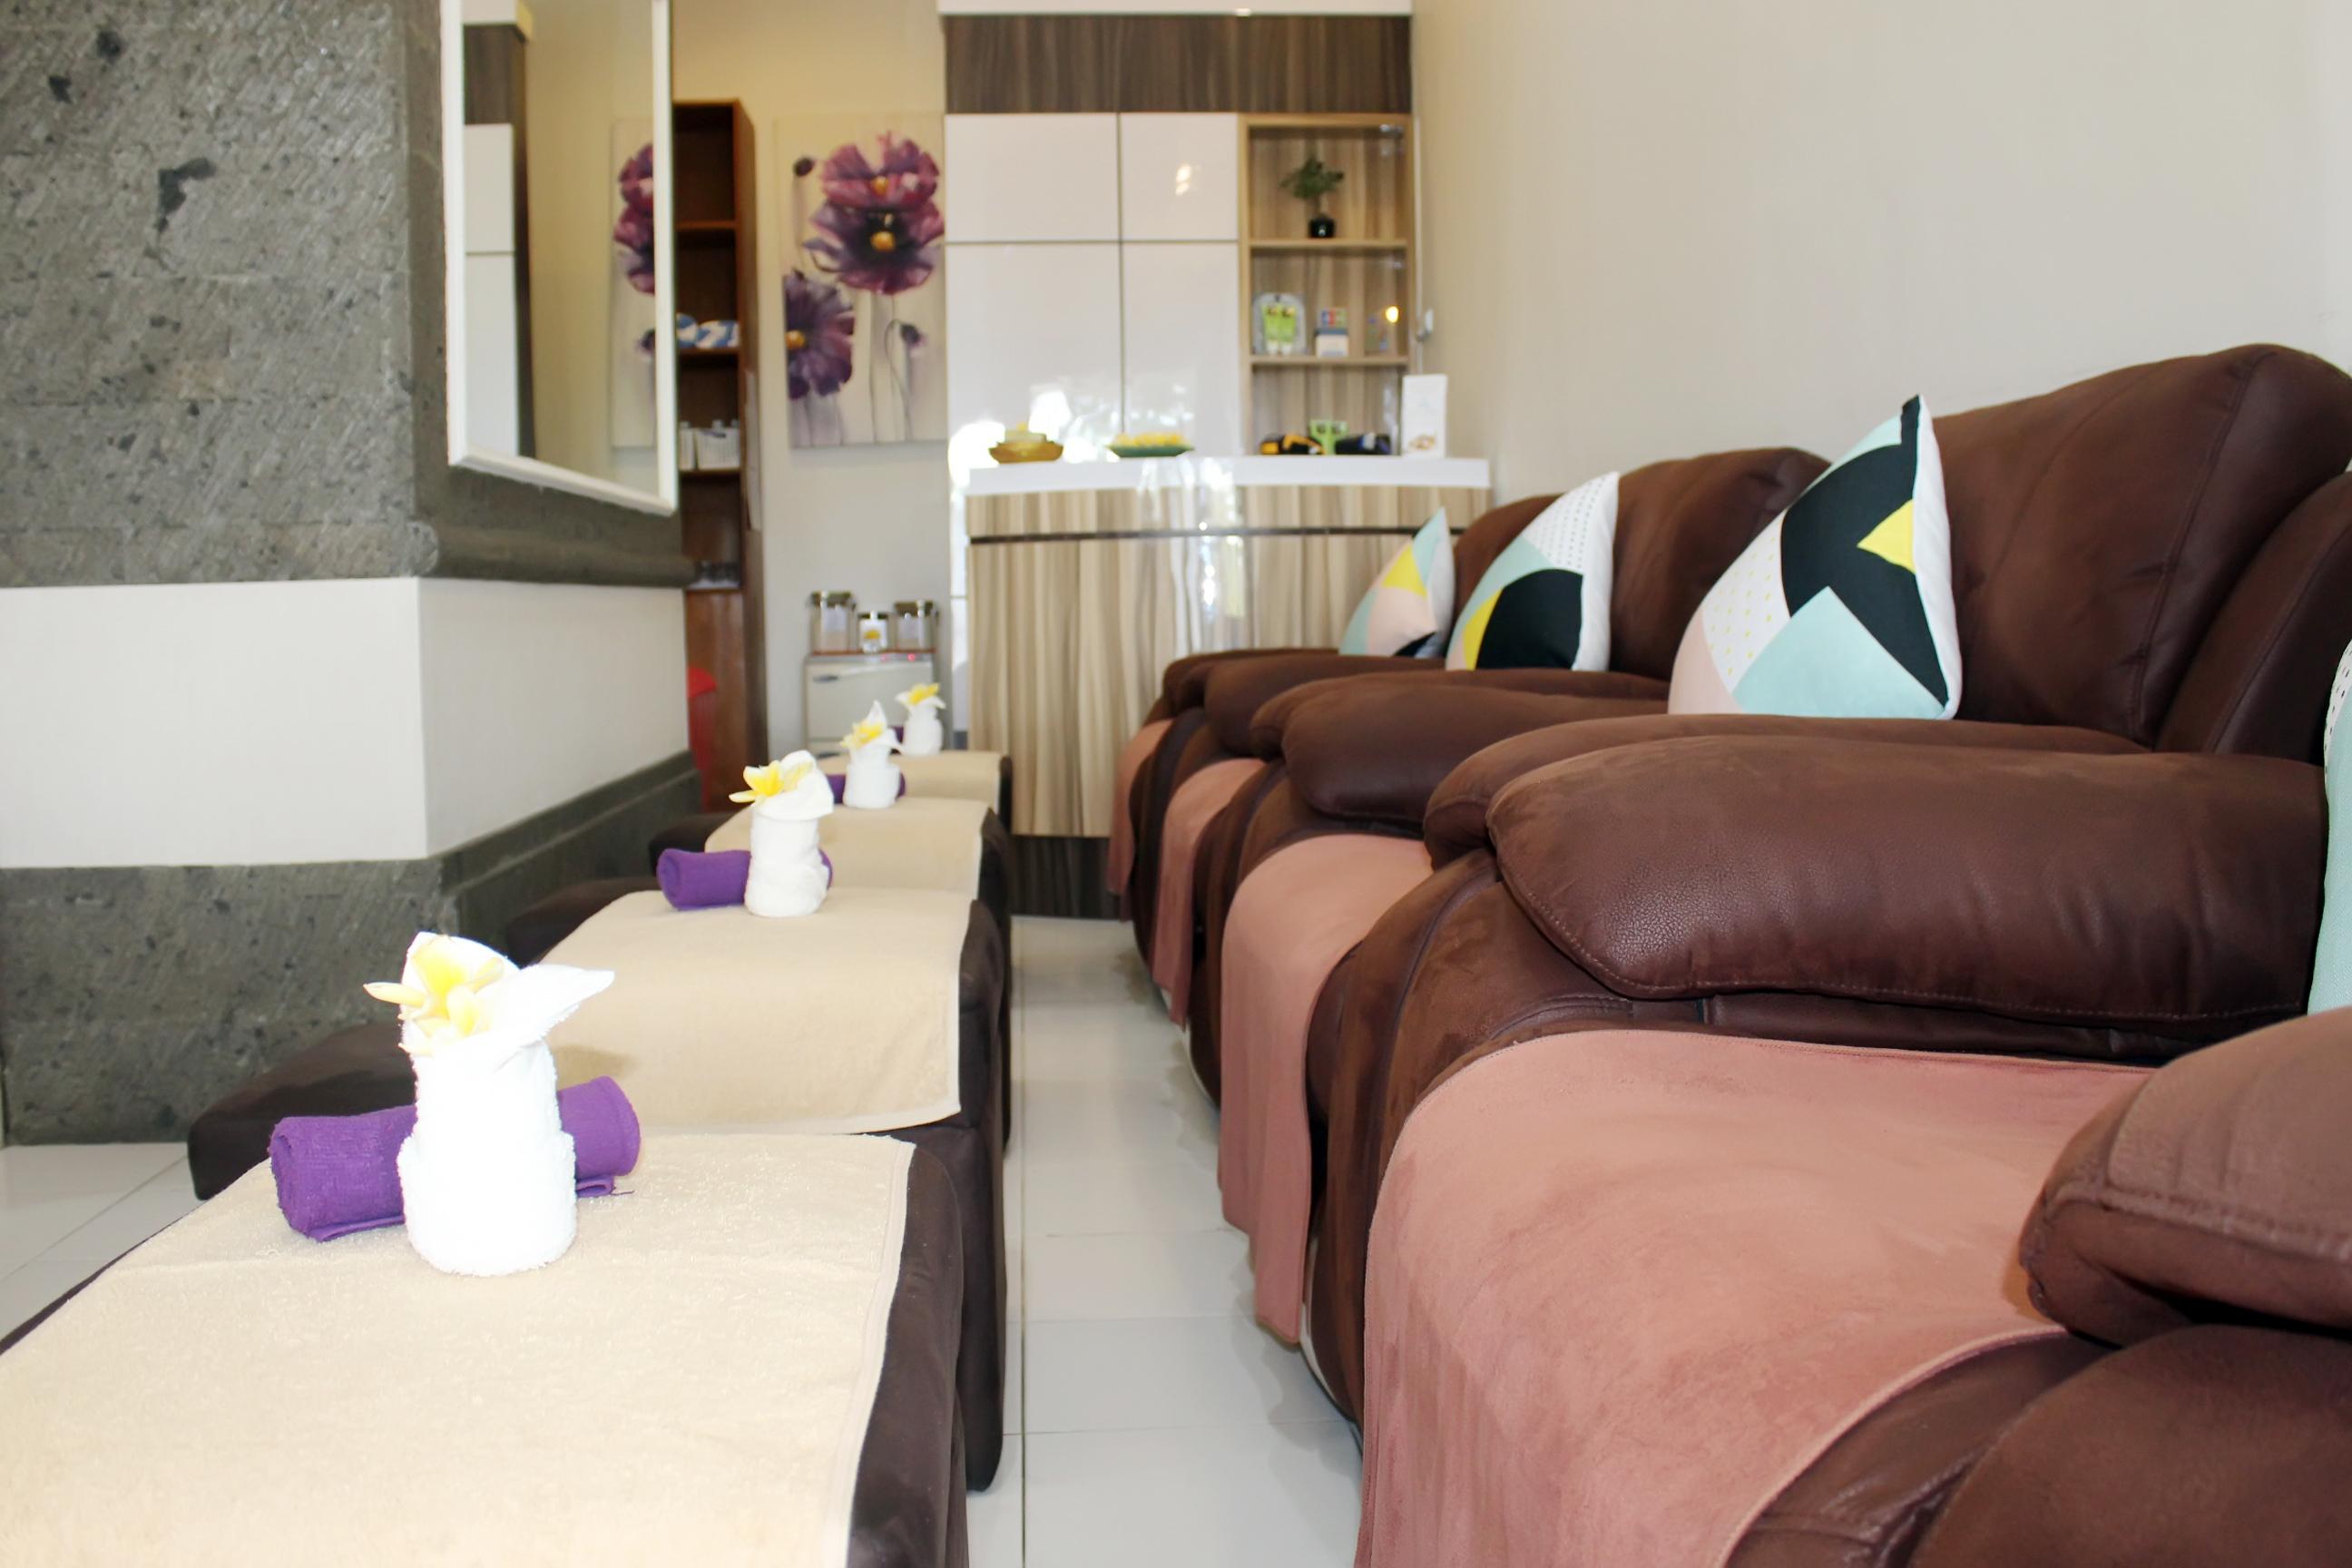 Foot massage area